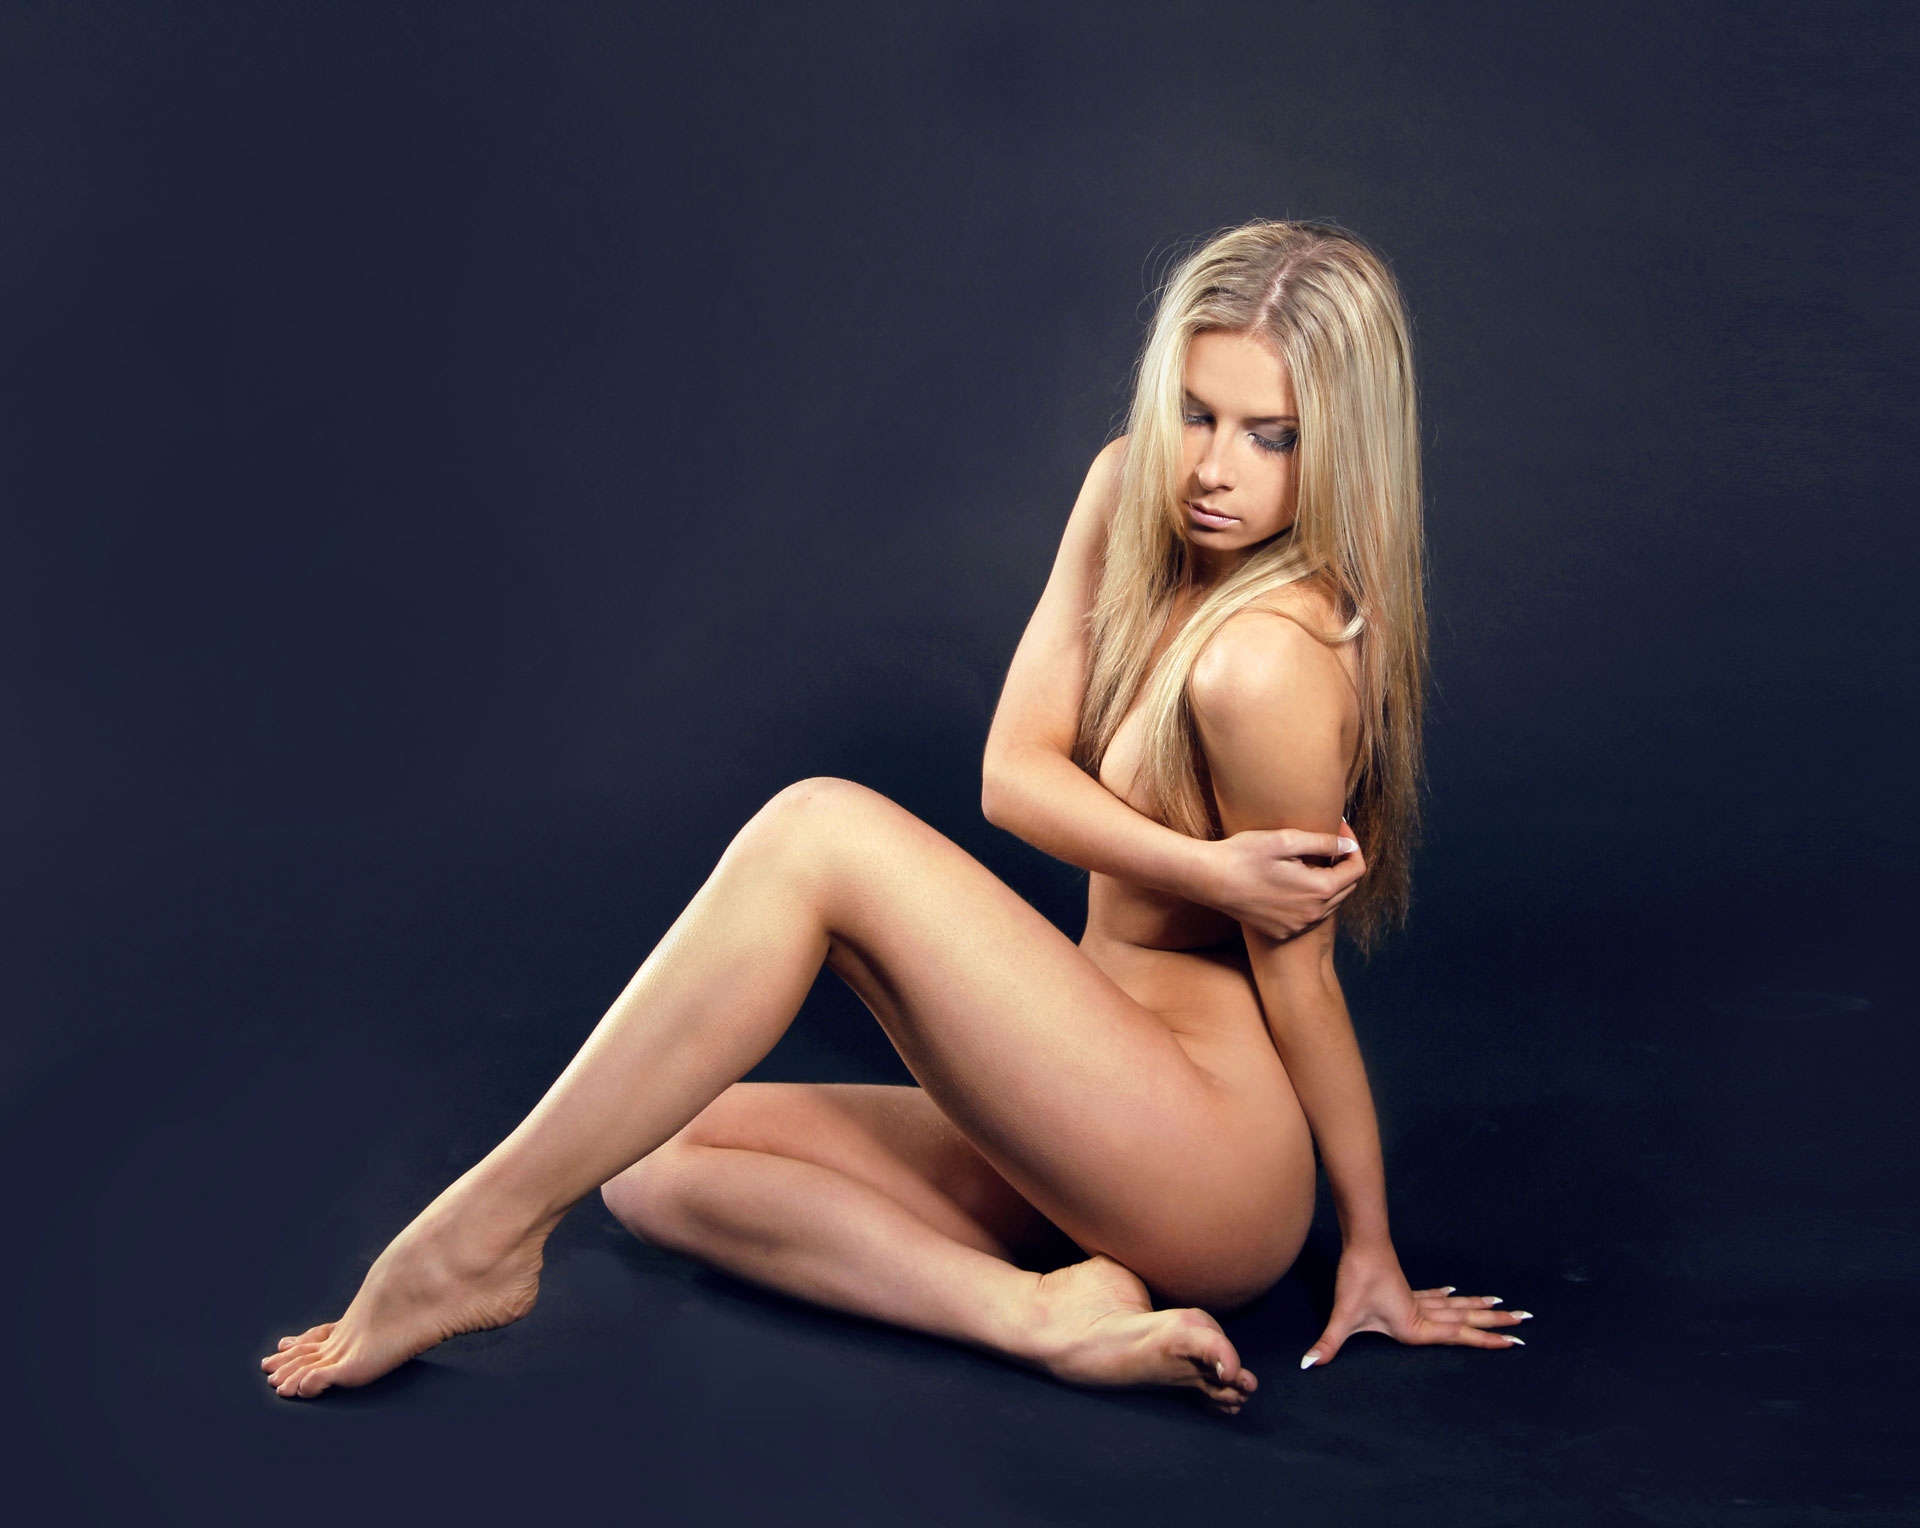 naked sexy girls everywhere